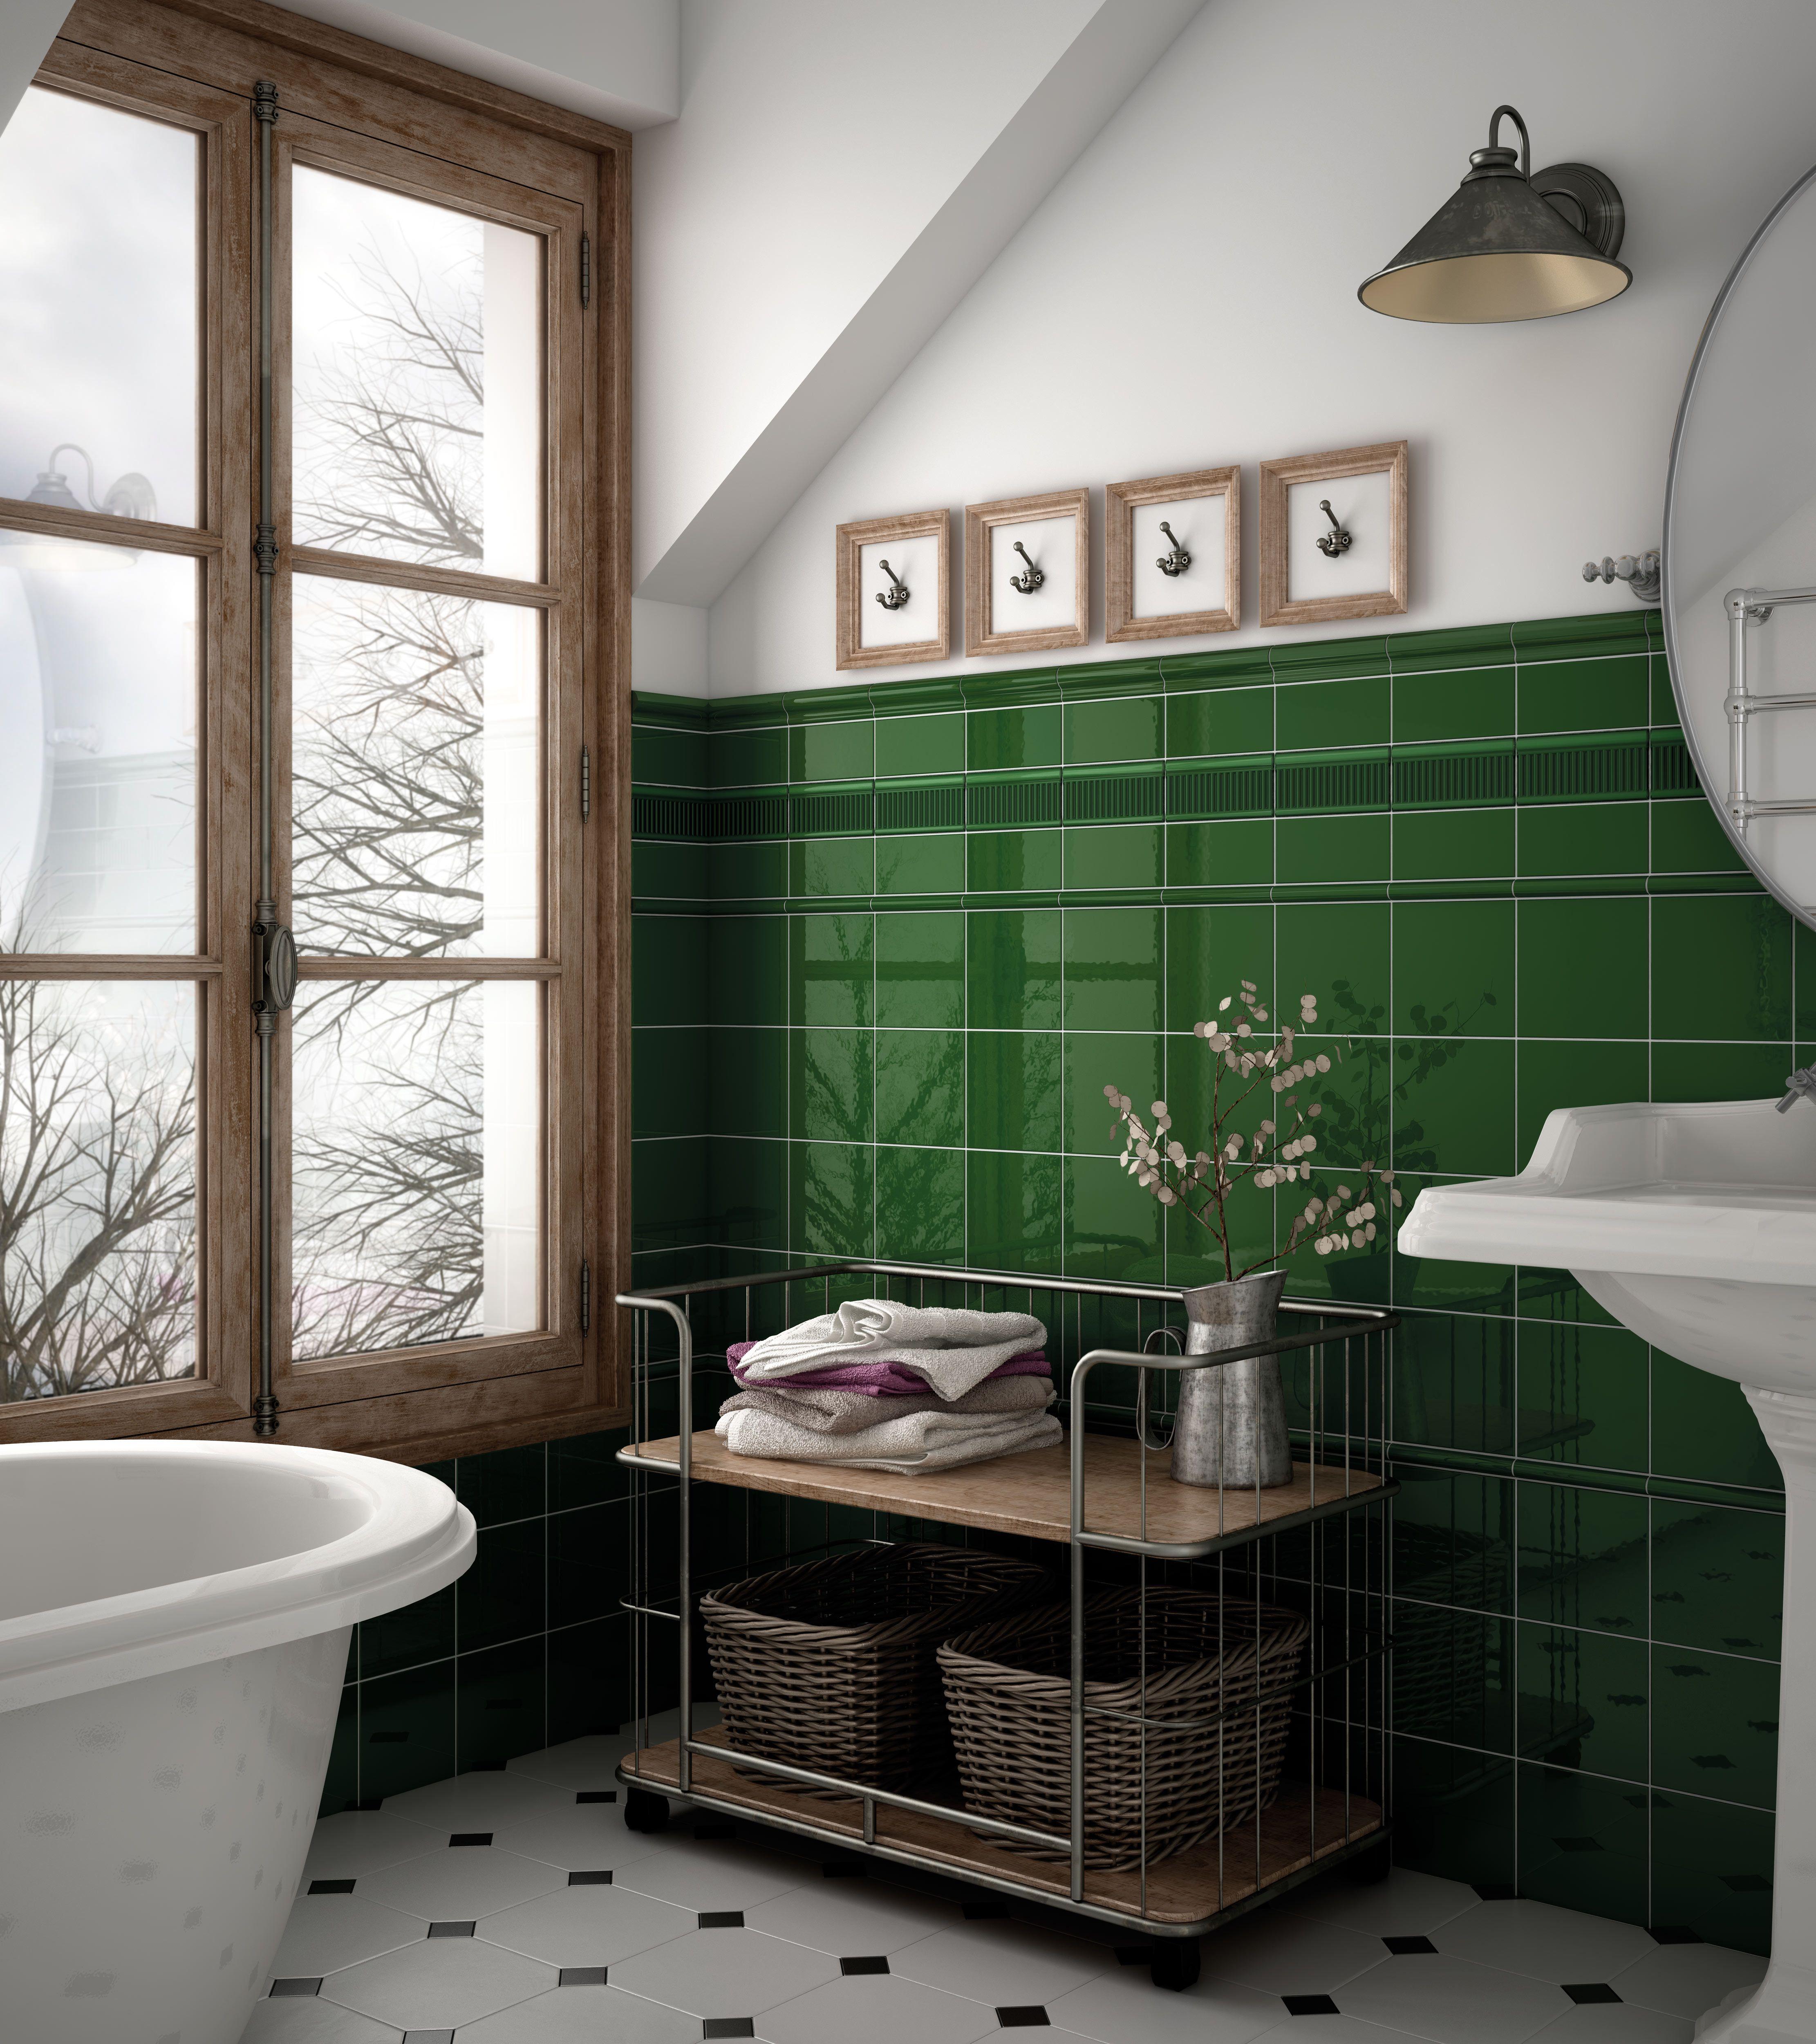 Reverse Metro Setting 4 Jpg 4443 5000 Green Tile Bathroom Bathroom Interior Design Green Bathroom